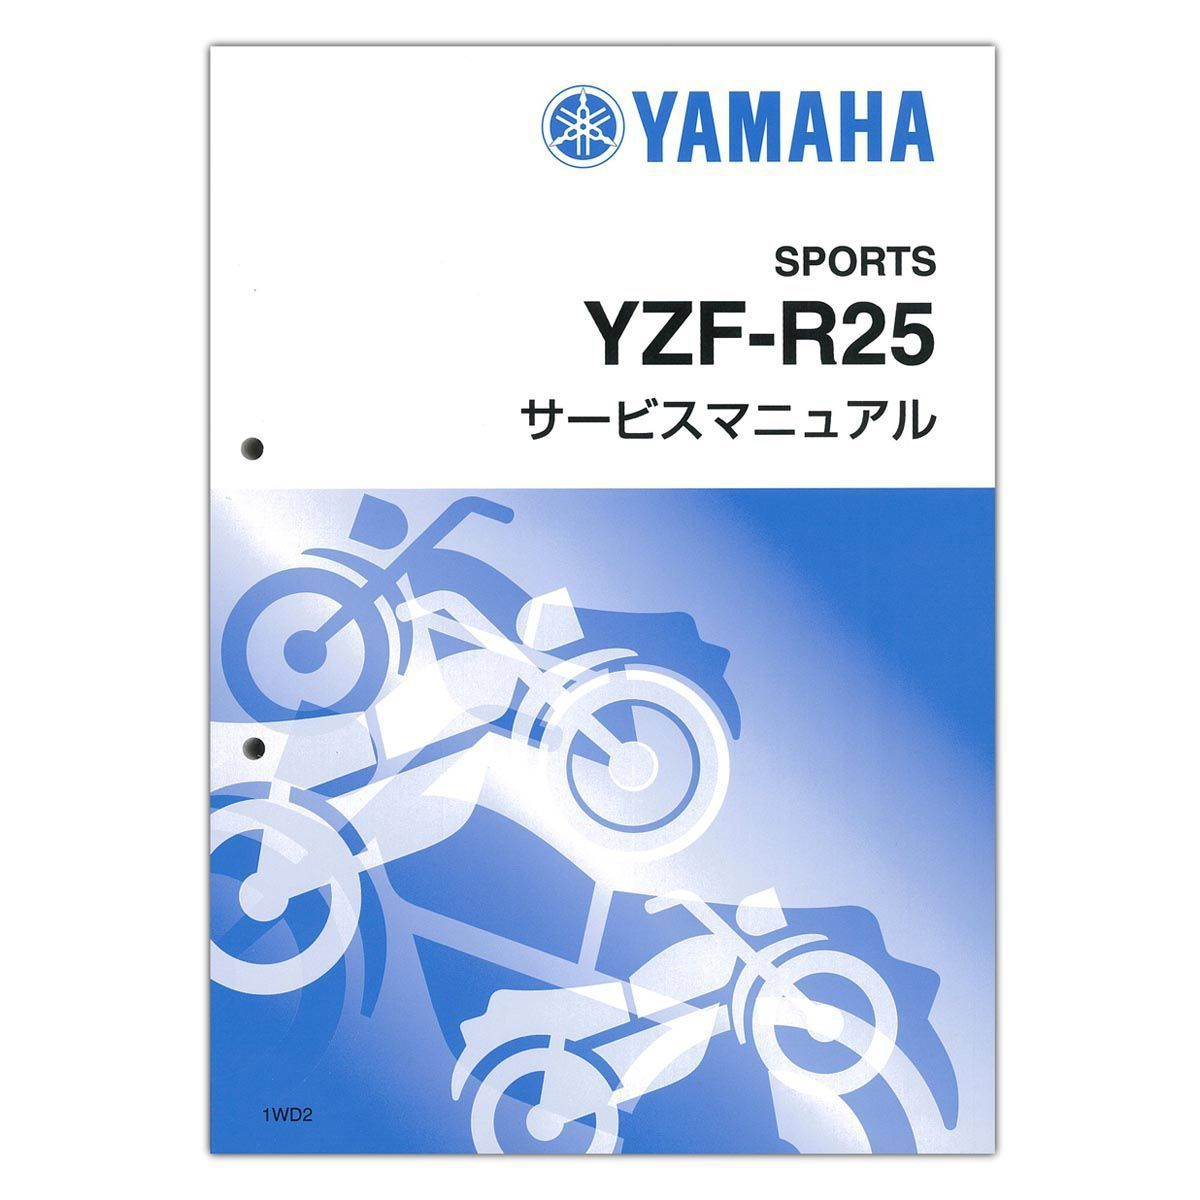 YAMAHA YZF-R25 サービスマニュアル(QQS-CLT-000-1WD)